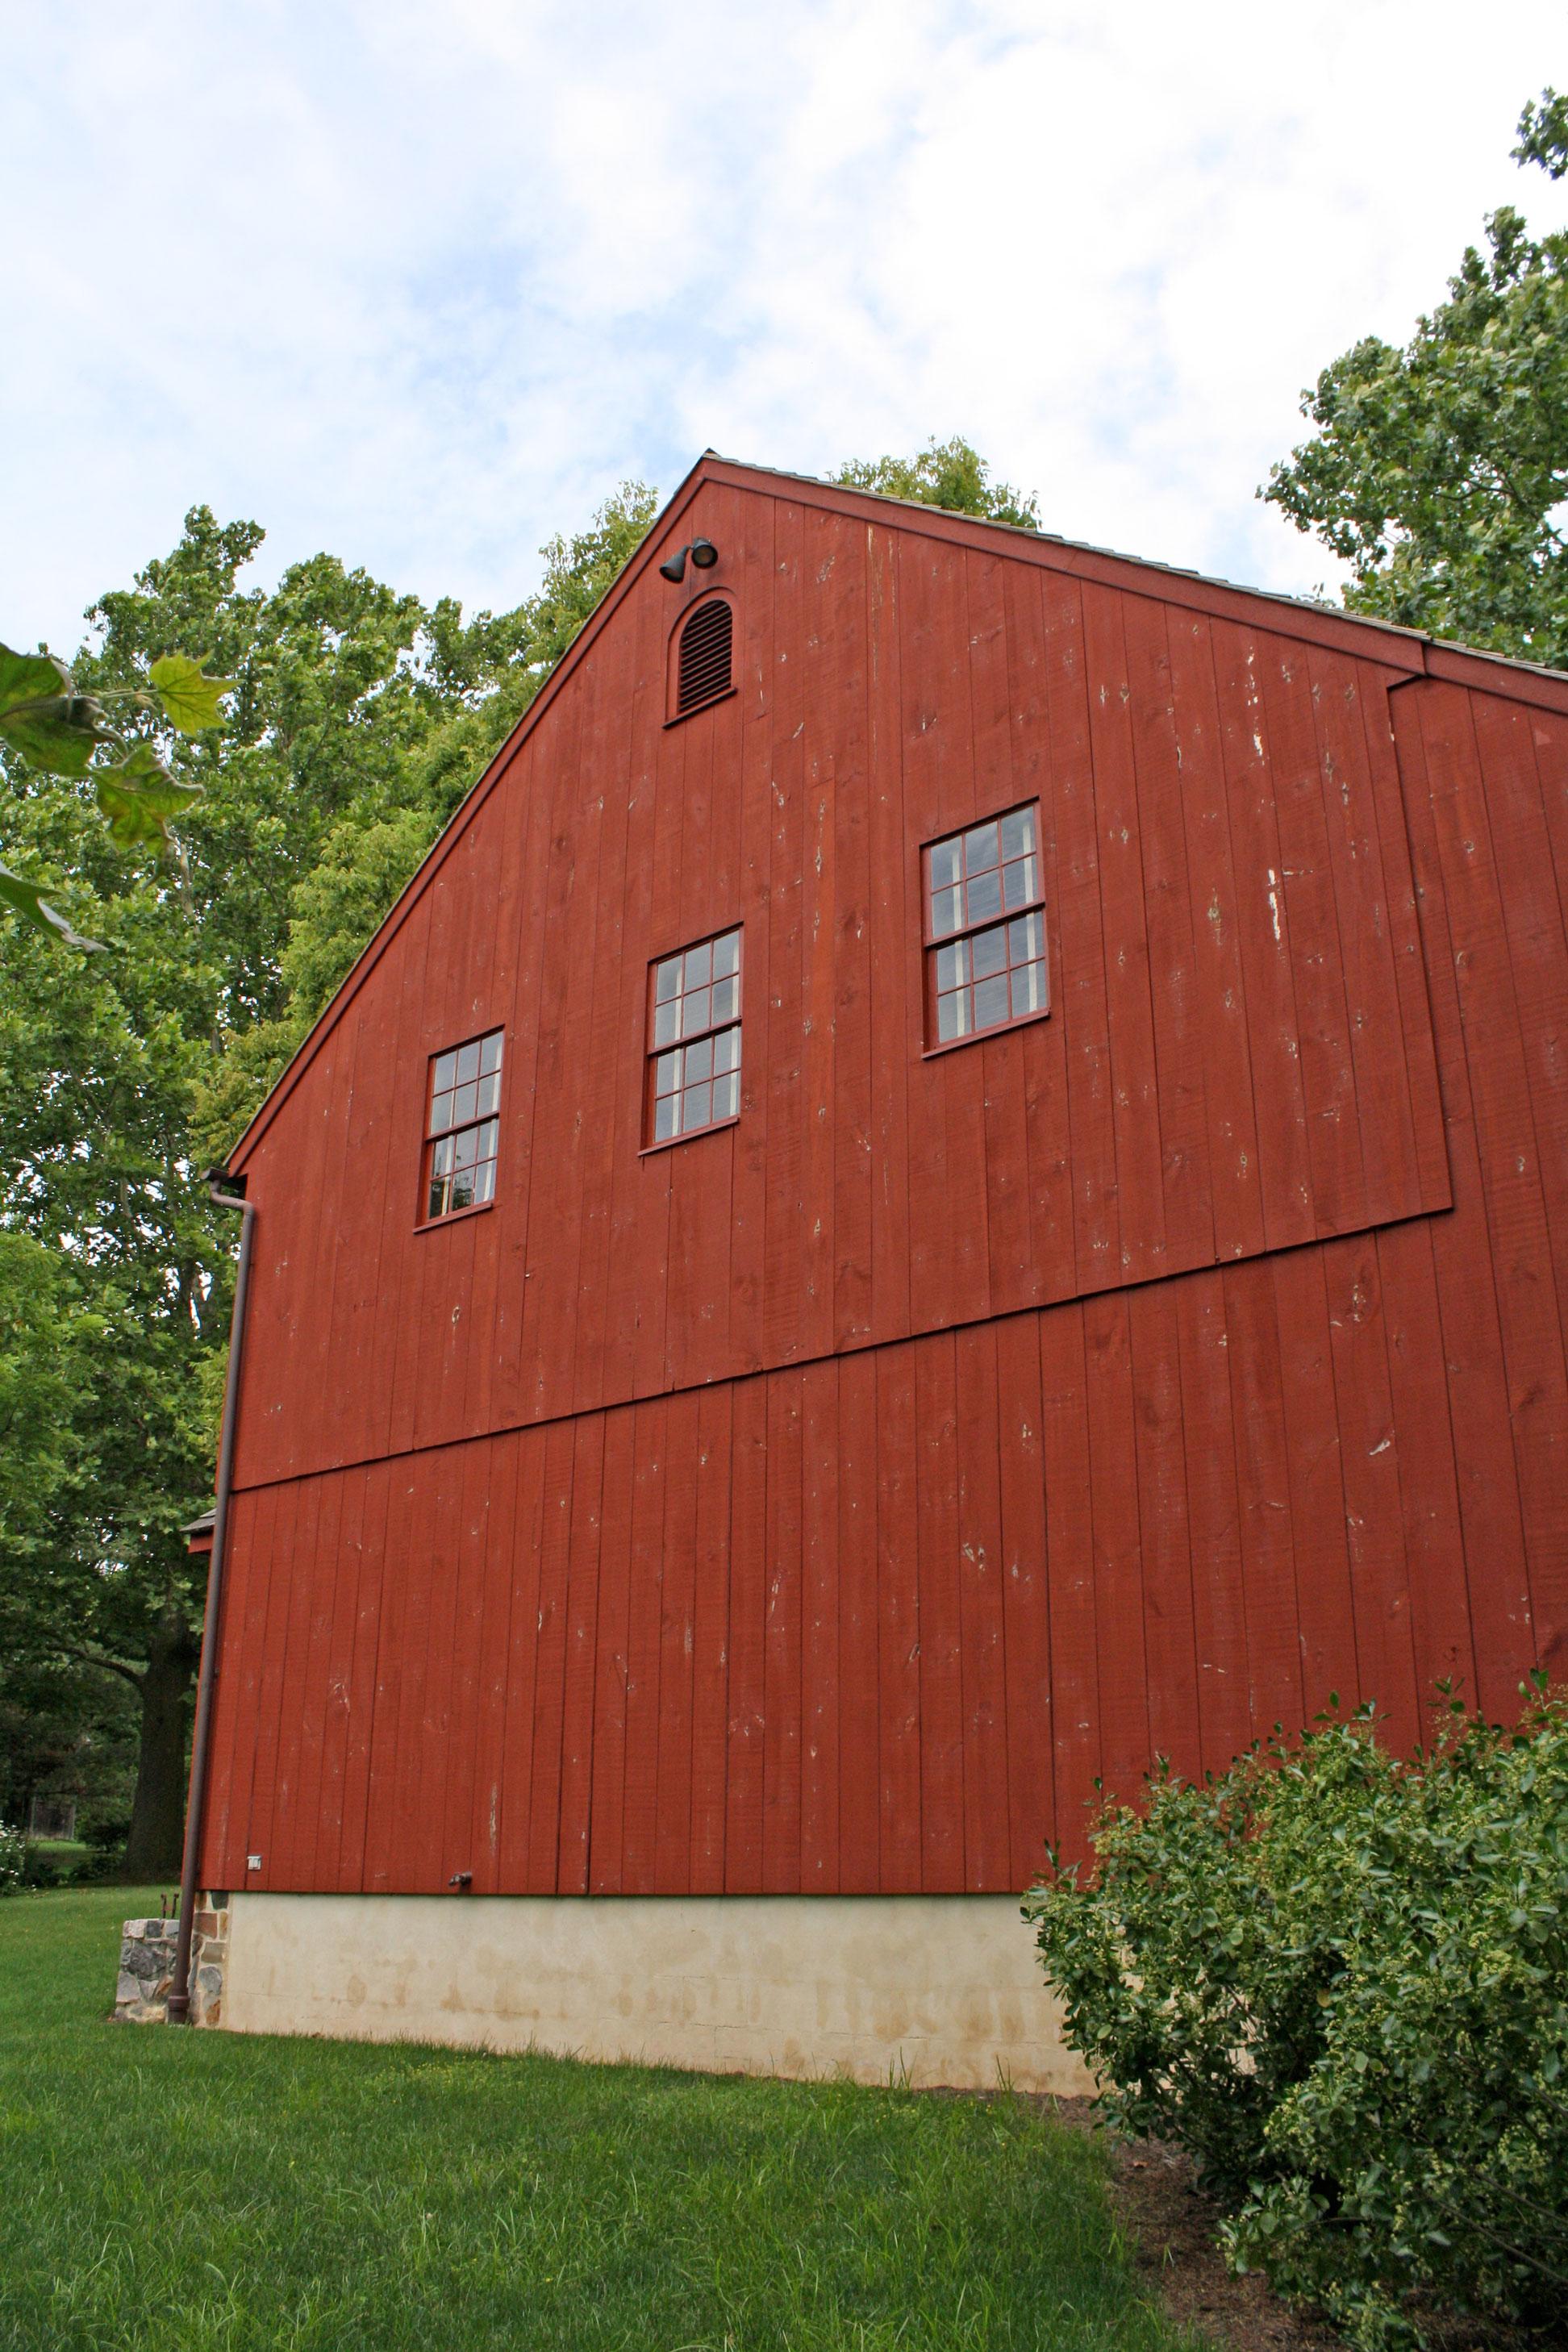 stone-barn-exterior-wood-side.jpg